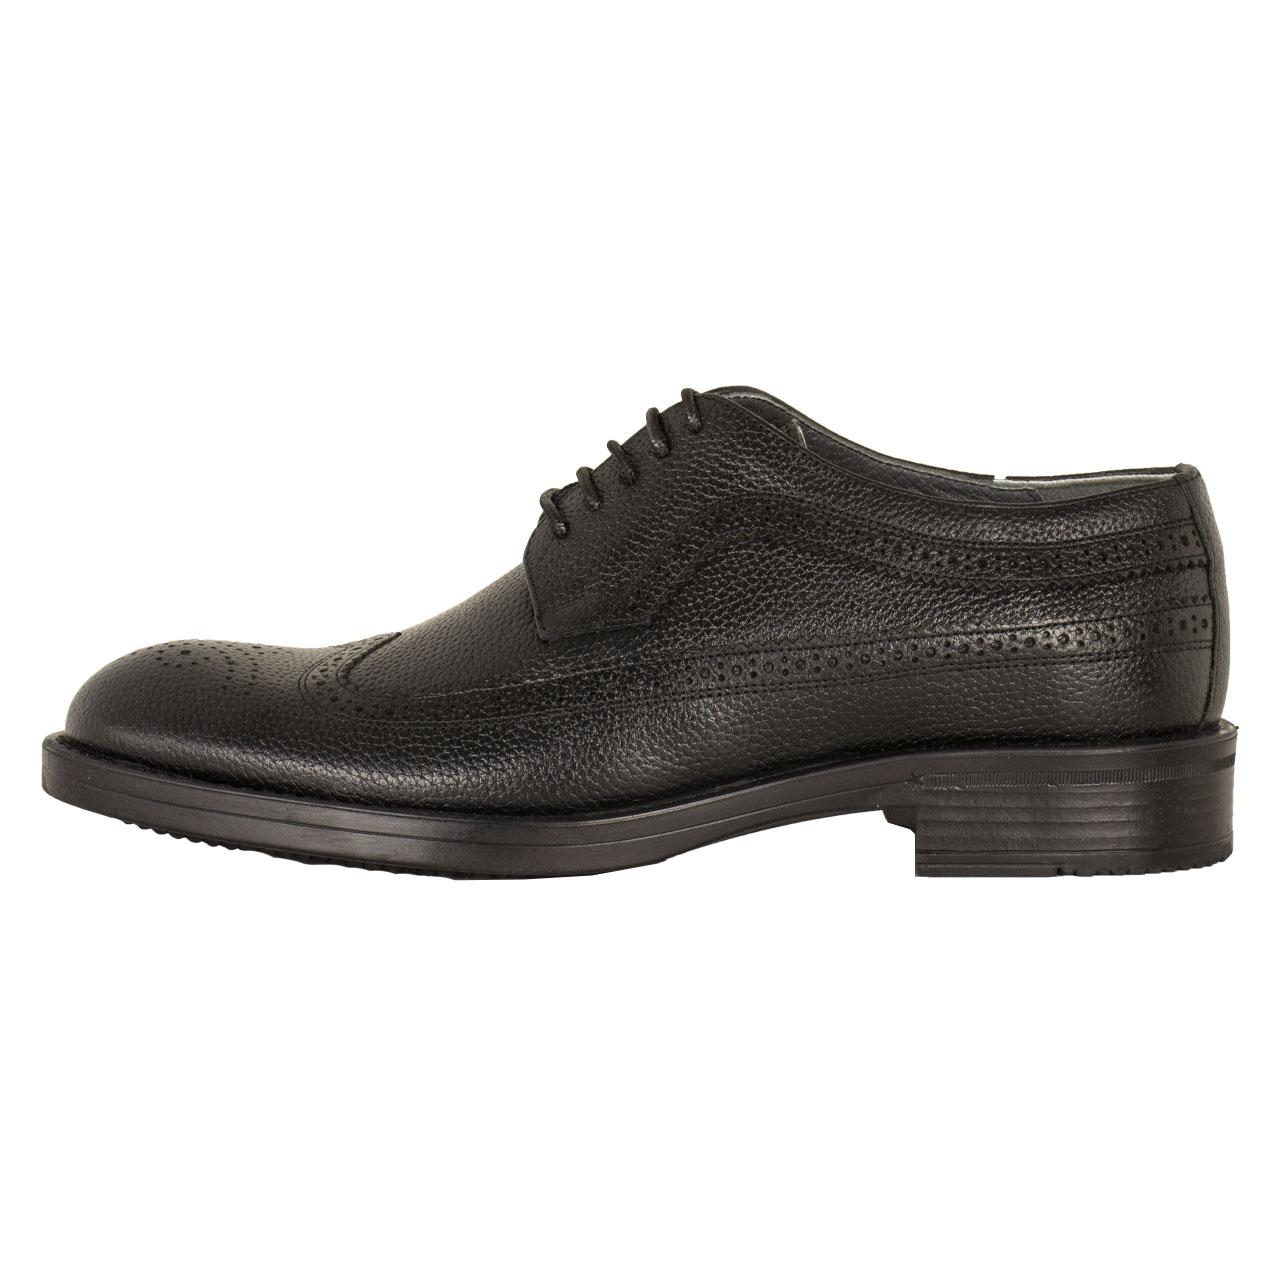 کفش مردانه پارینه چرم مدل SHO216